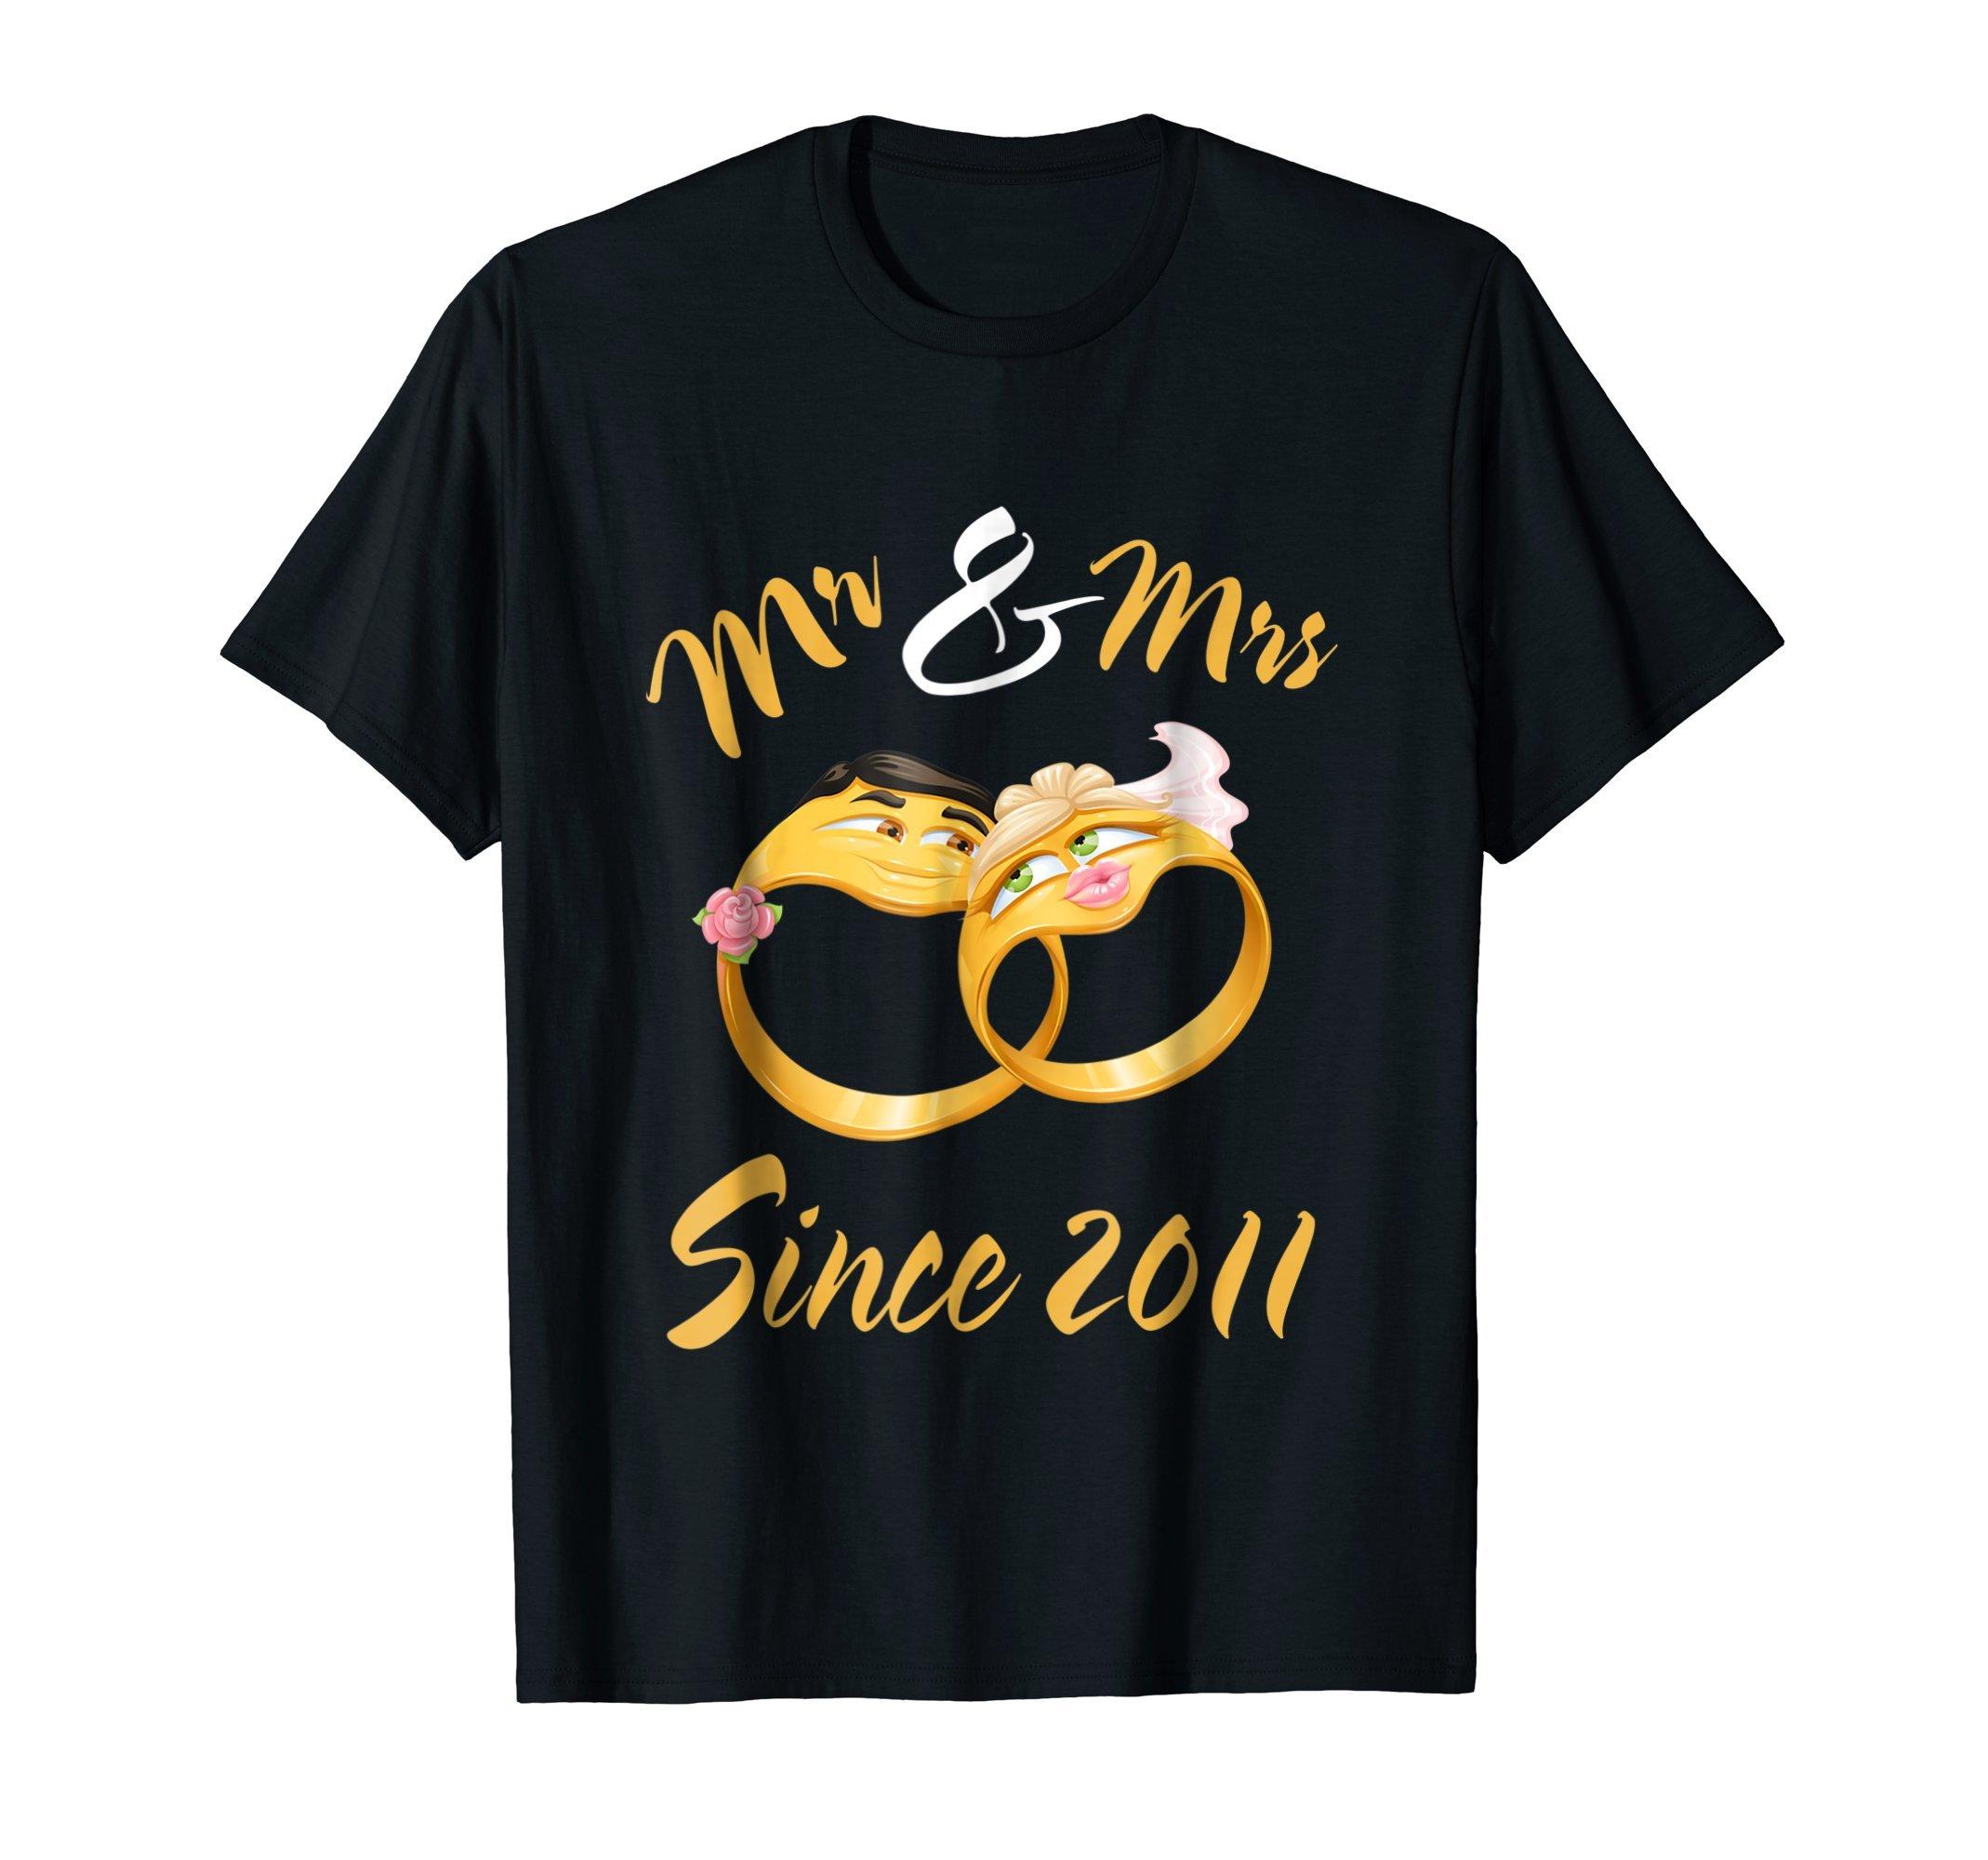 Mr & Mrs Since 2011 T-Shirt Wedding Anniversary Gift Tee